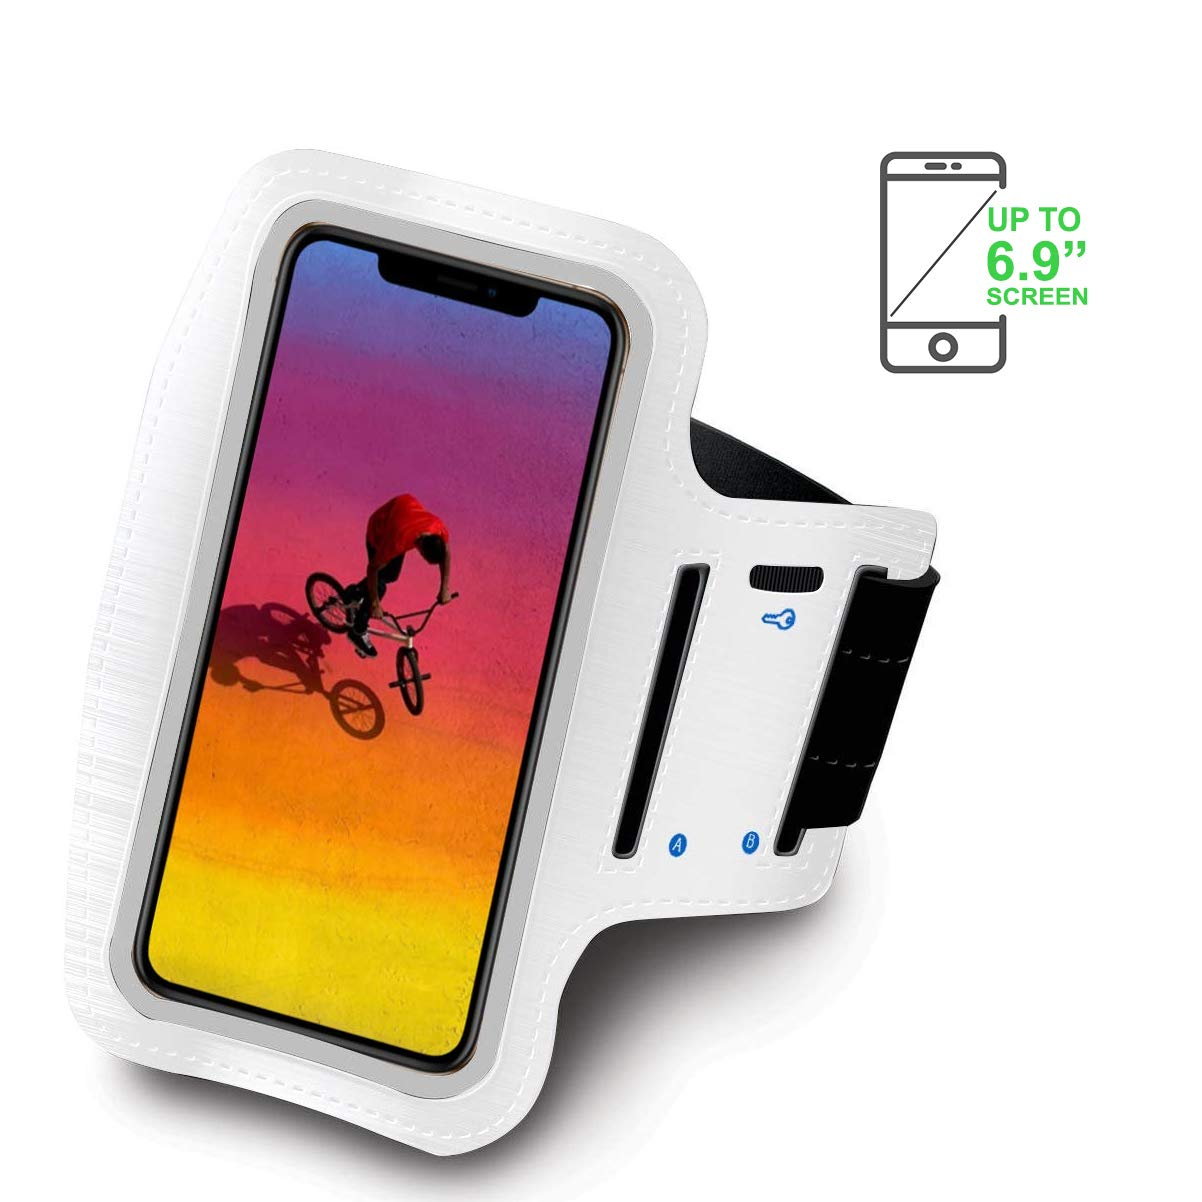 Blanco Brazalete Deportivo Compatible con Xiaomi Mi MAX 3 Running Neopreno Ajustable Velcro antisudor Antideslizante Bolsillo para Auriculares Llaves